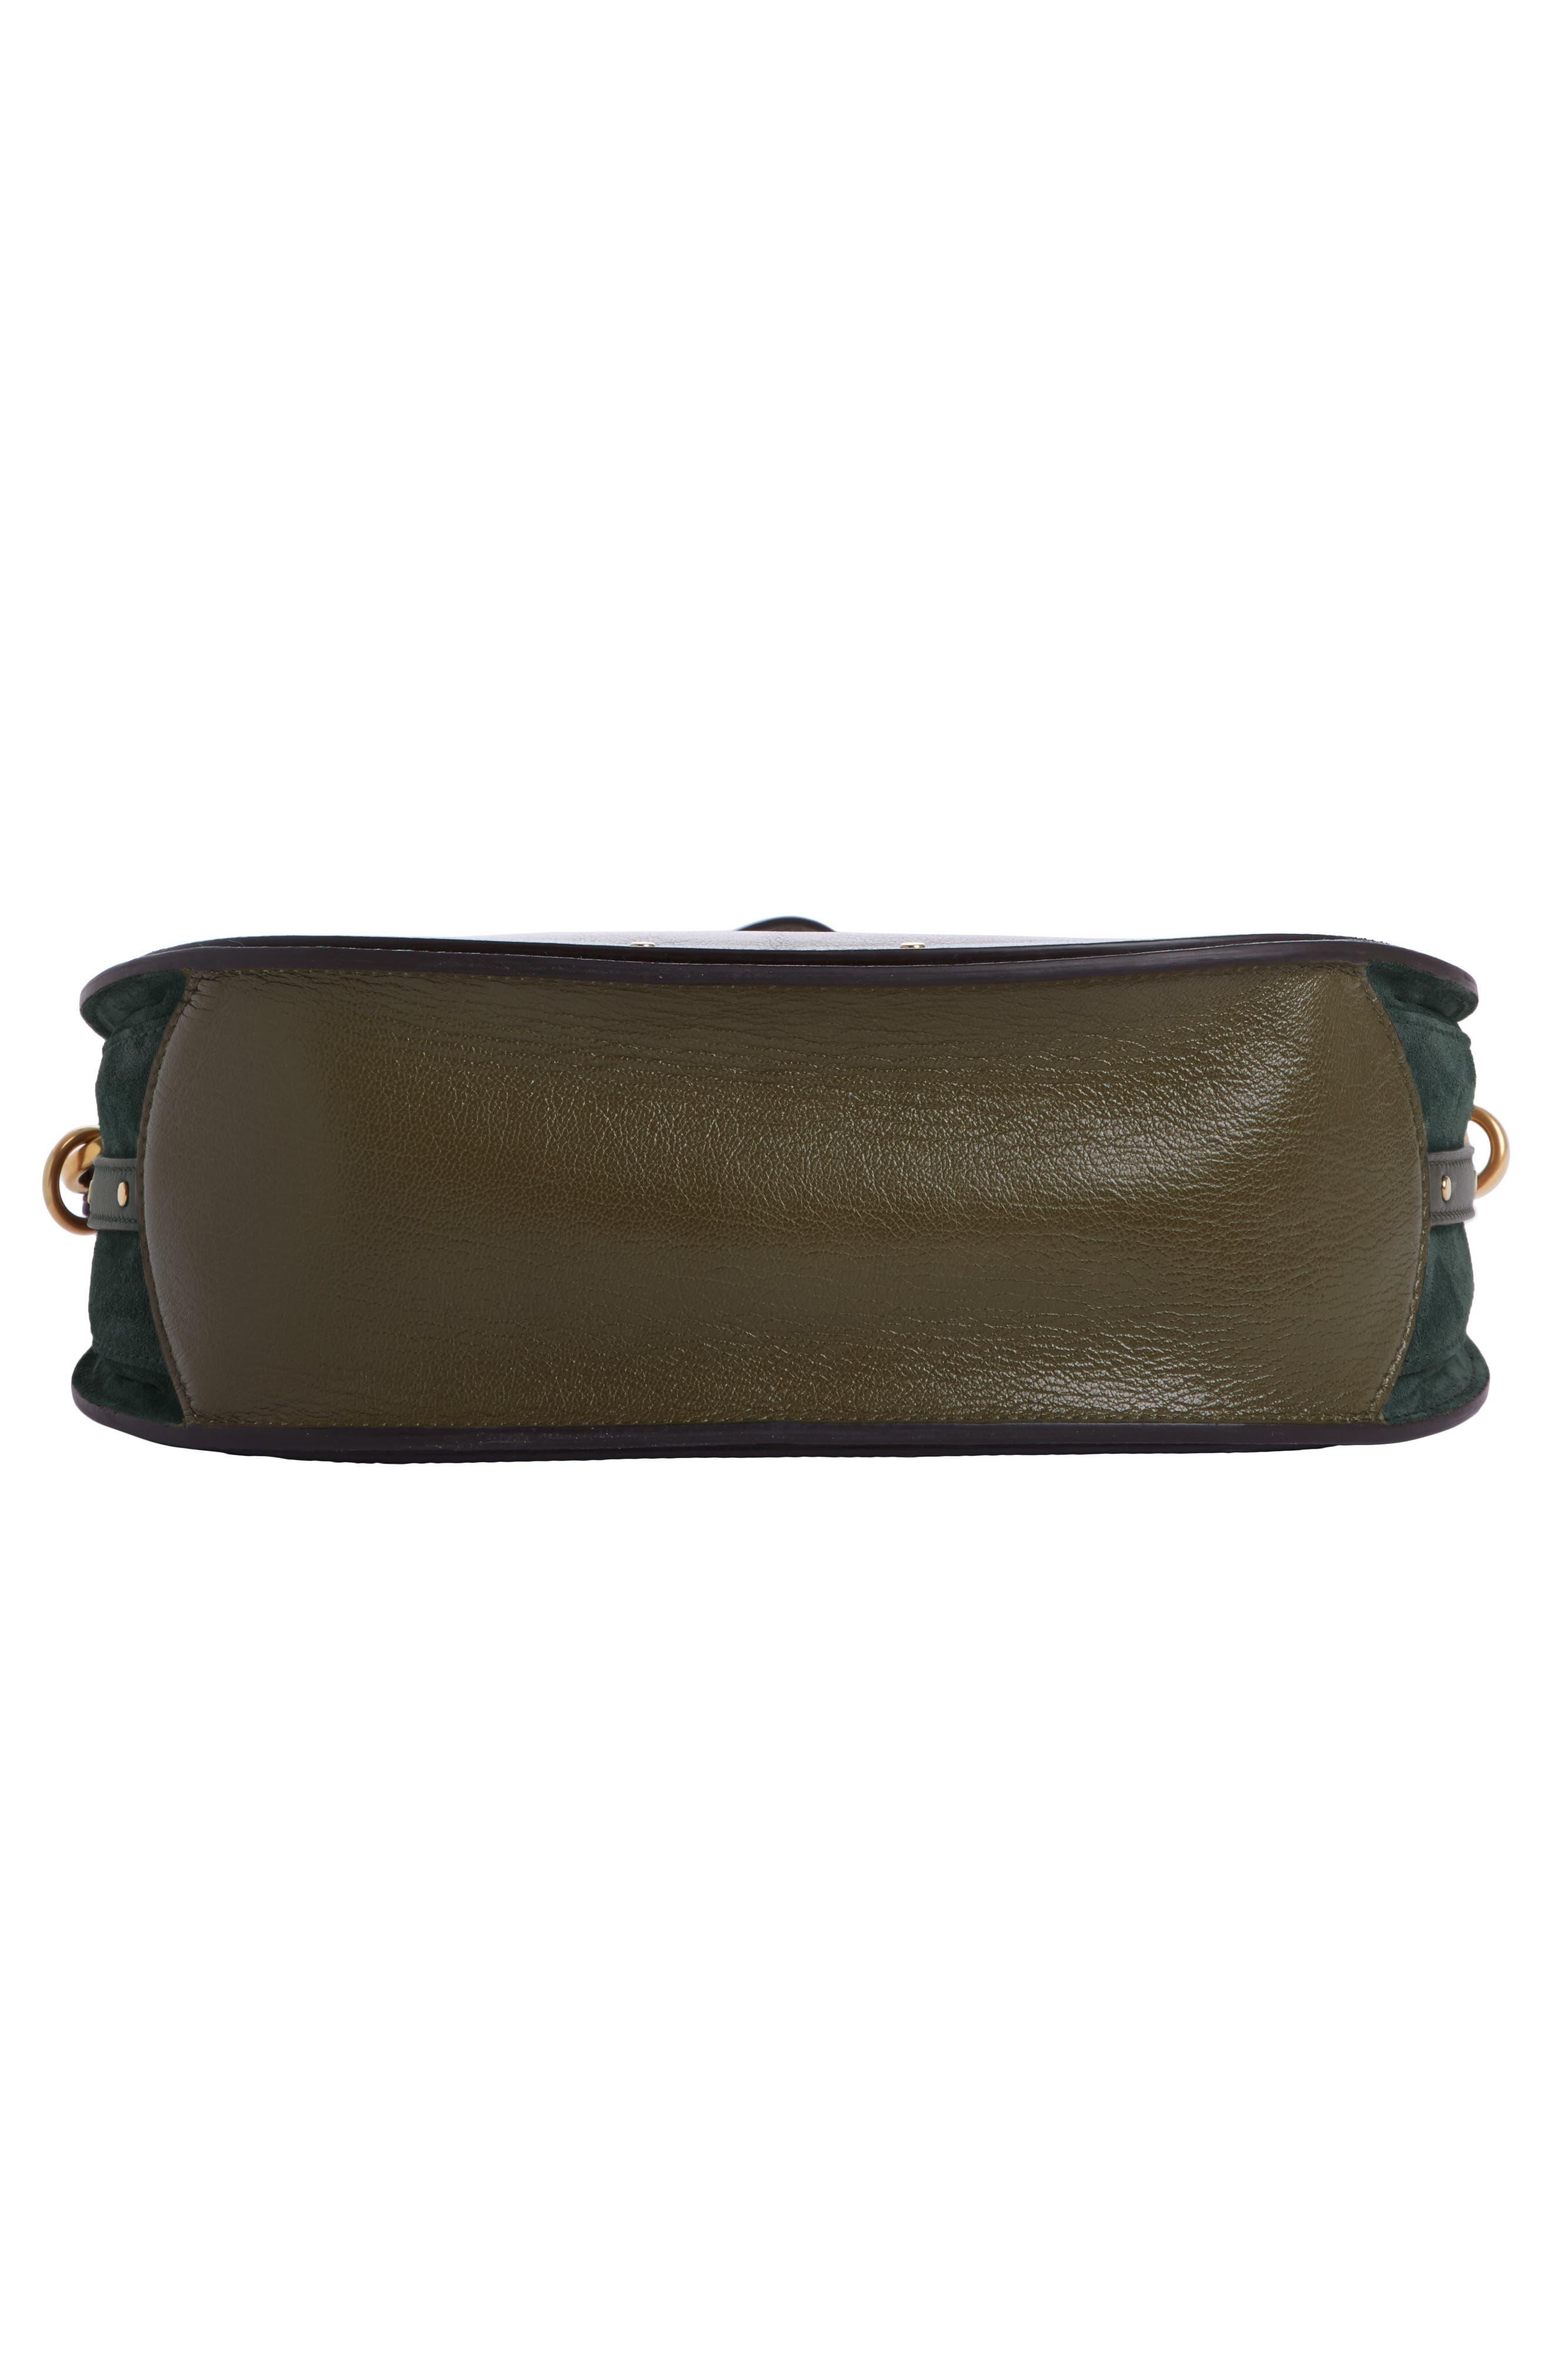 Medium Pixie Top Handle Leather Satchel,                             Alternate thumbnail 4, color,                             Intense Green